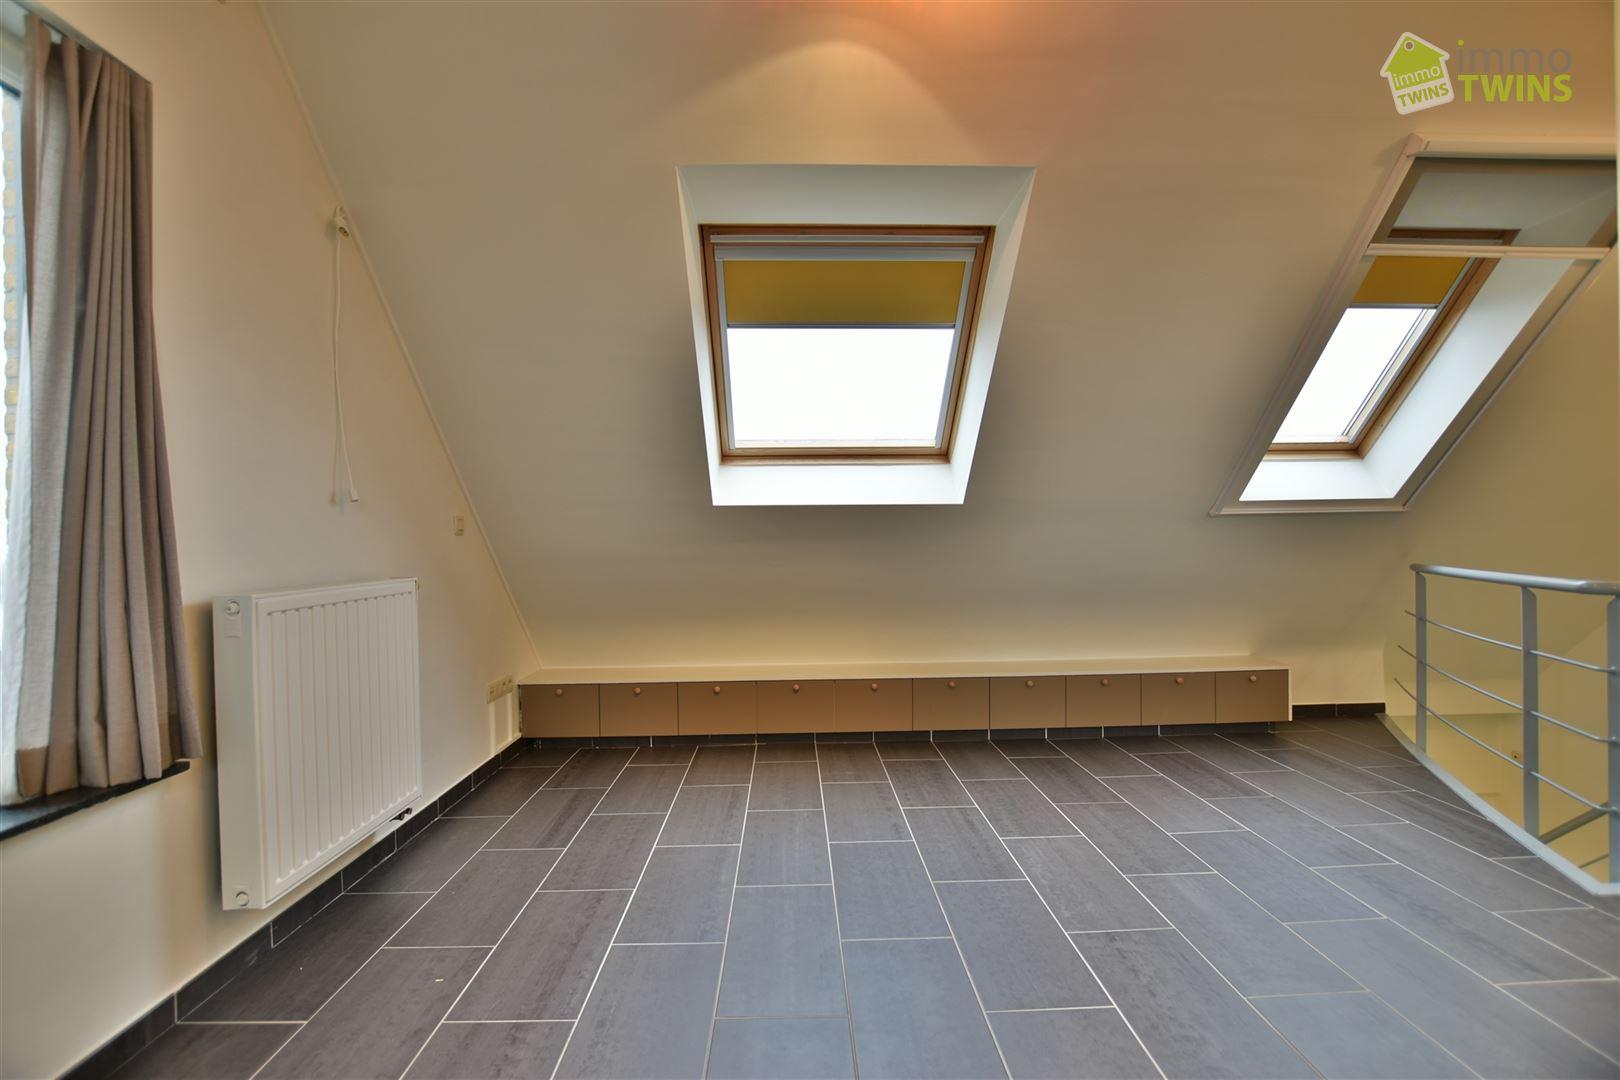 Foto 15 : Appartement te 9200 BAASRODE (België) - Prijs € 650